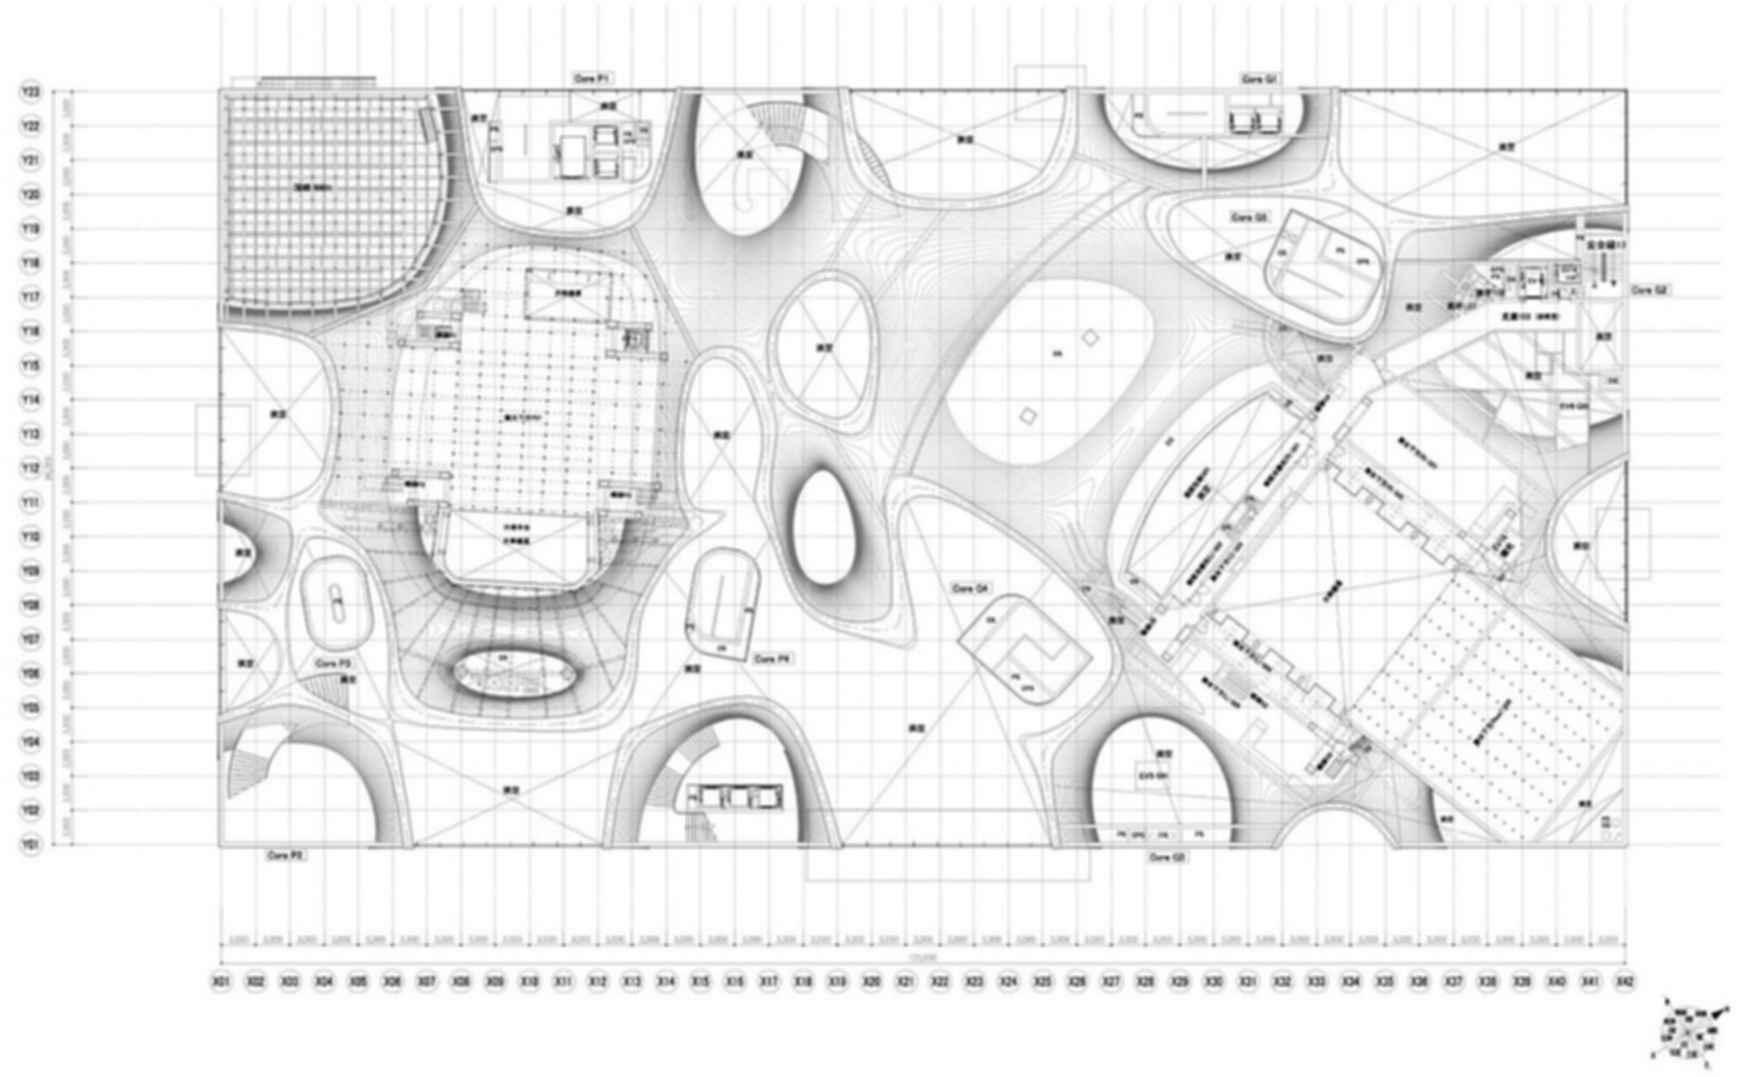 Taichung Metropolitan Opera House - Site Plan